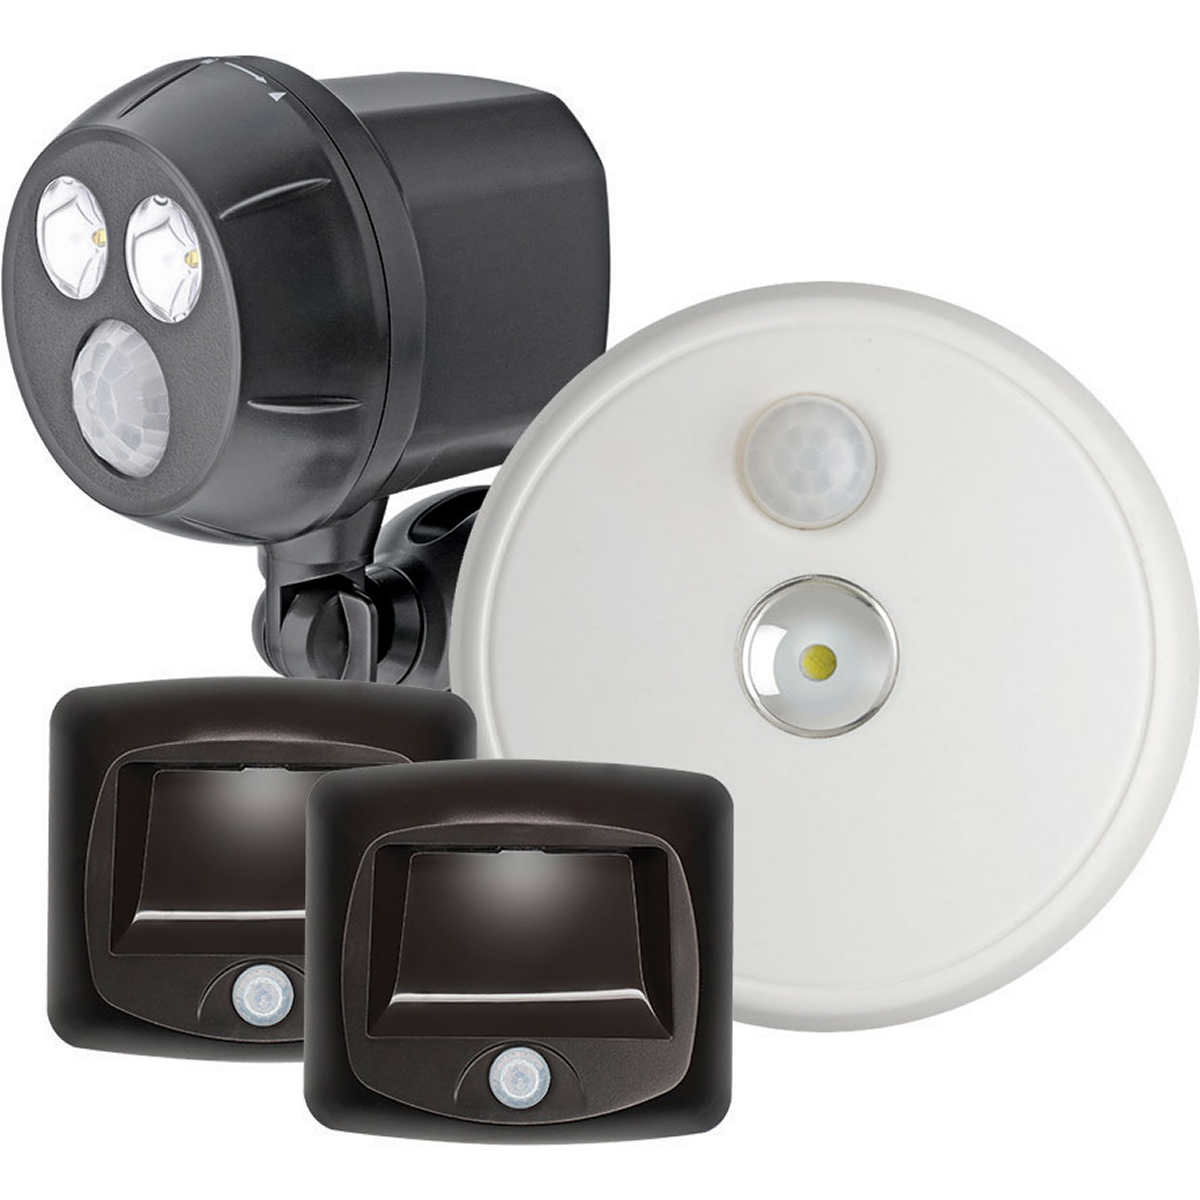 Mr Beams Shed Combo Kit Motion Sensor Wireless Led Lights